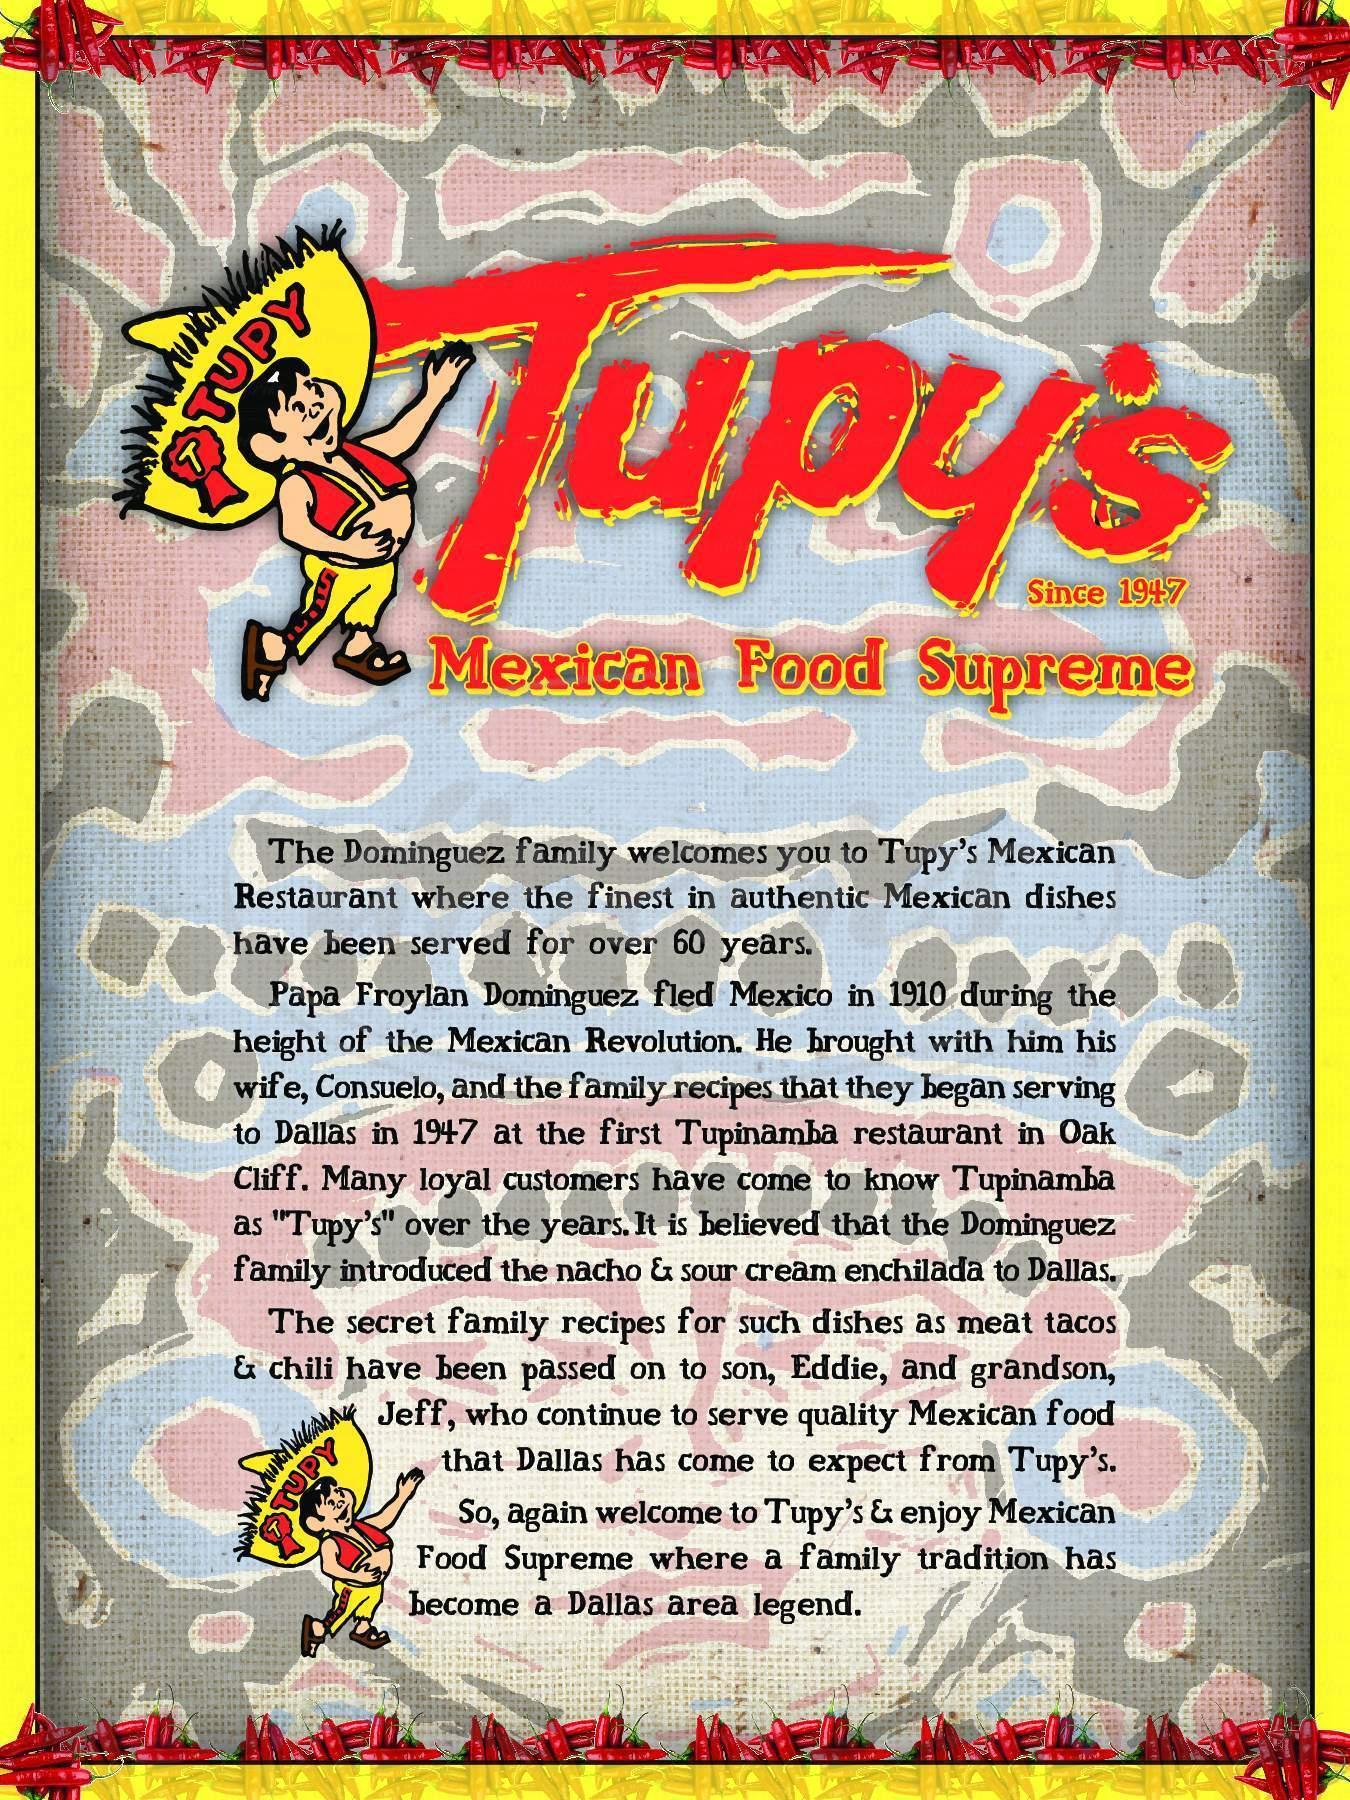 menu for Tupy's Mexician Food Supreme